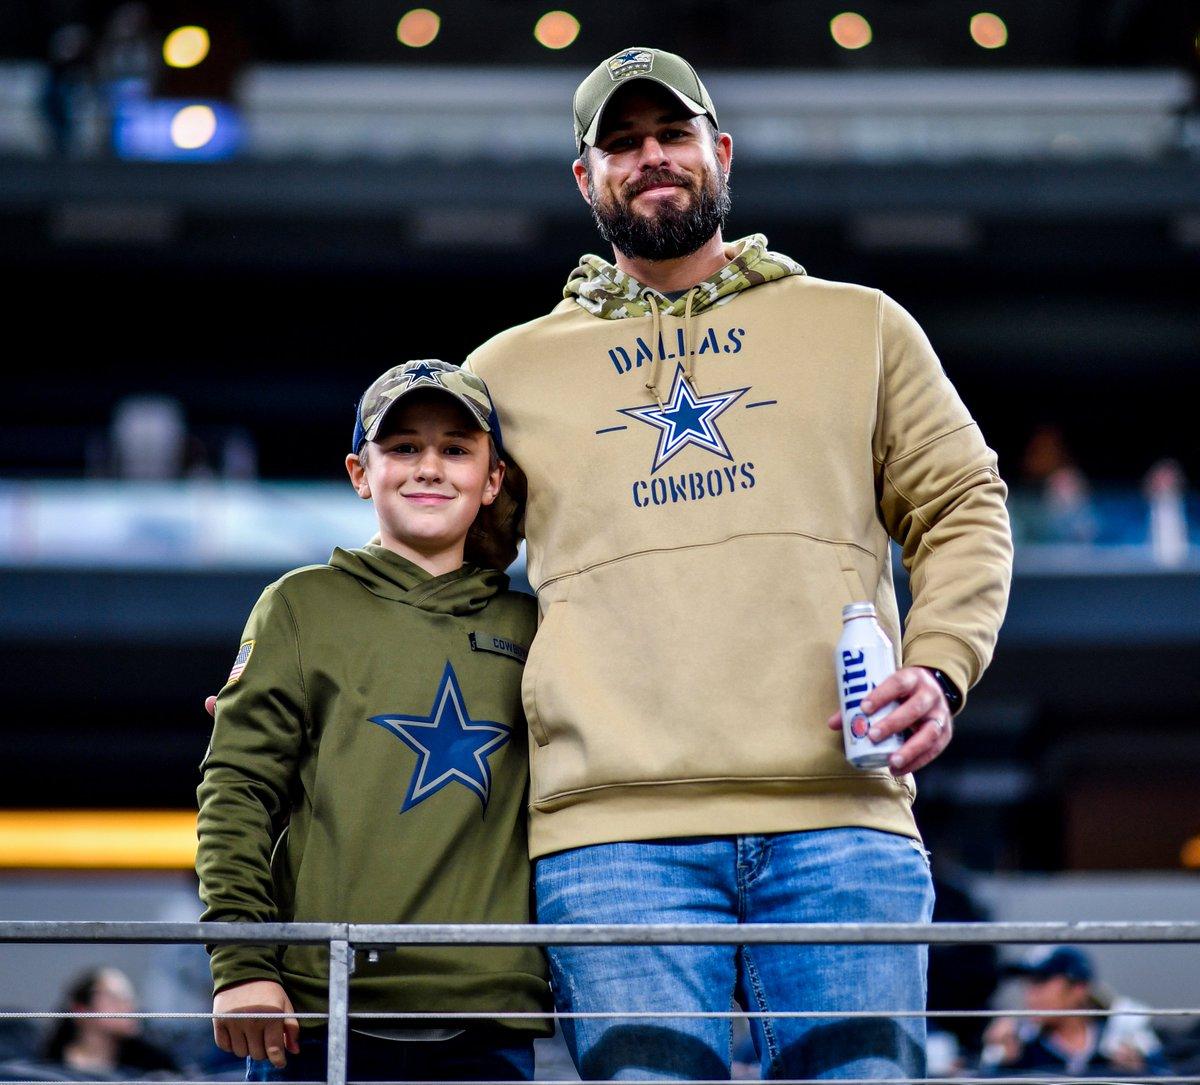 #CowboysNation, Happy #FathersDay from #ATTStadium! 💙🏈 https://t.co/KPlGEo6O7V